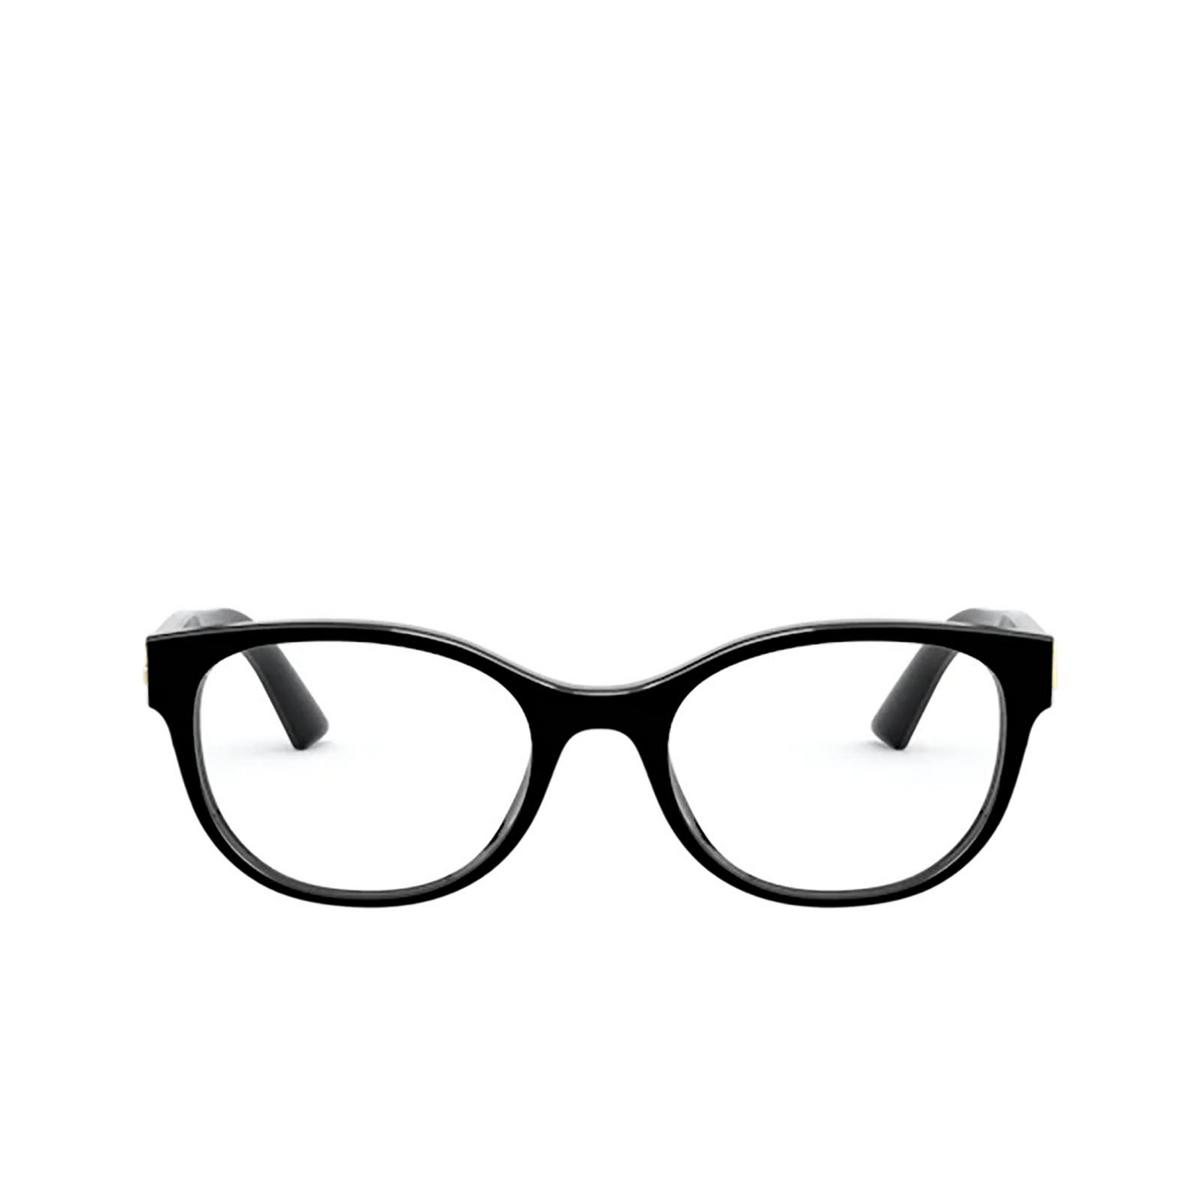 Dolce & Gabbana® Oval Eyeglasses: DG3327 color Black 501 - front view.